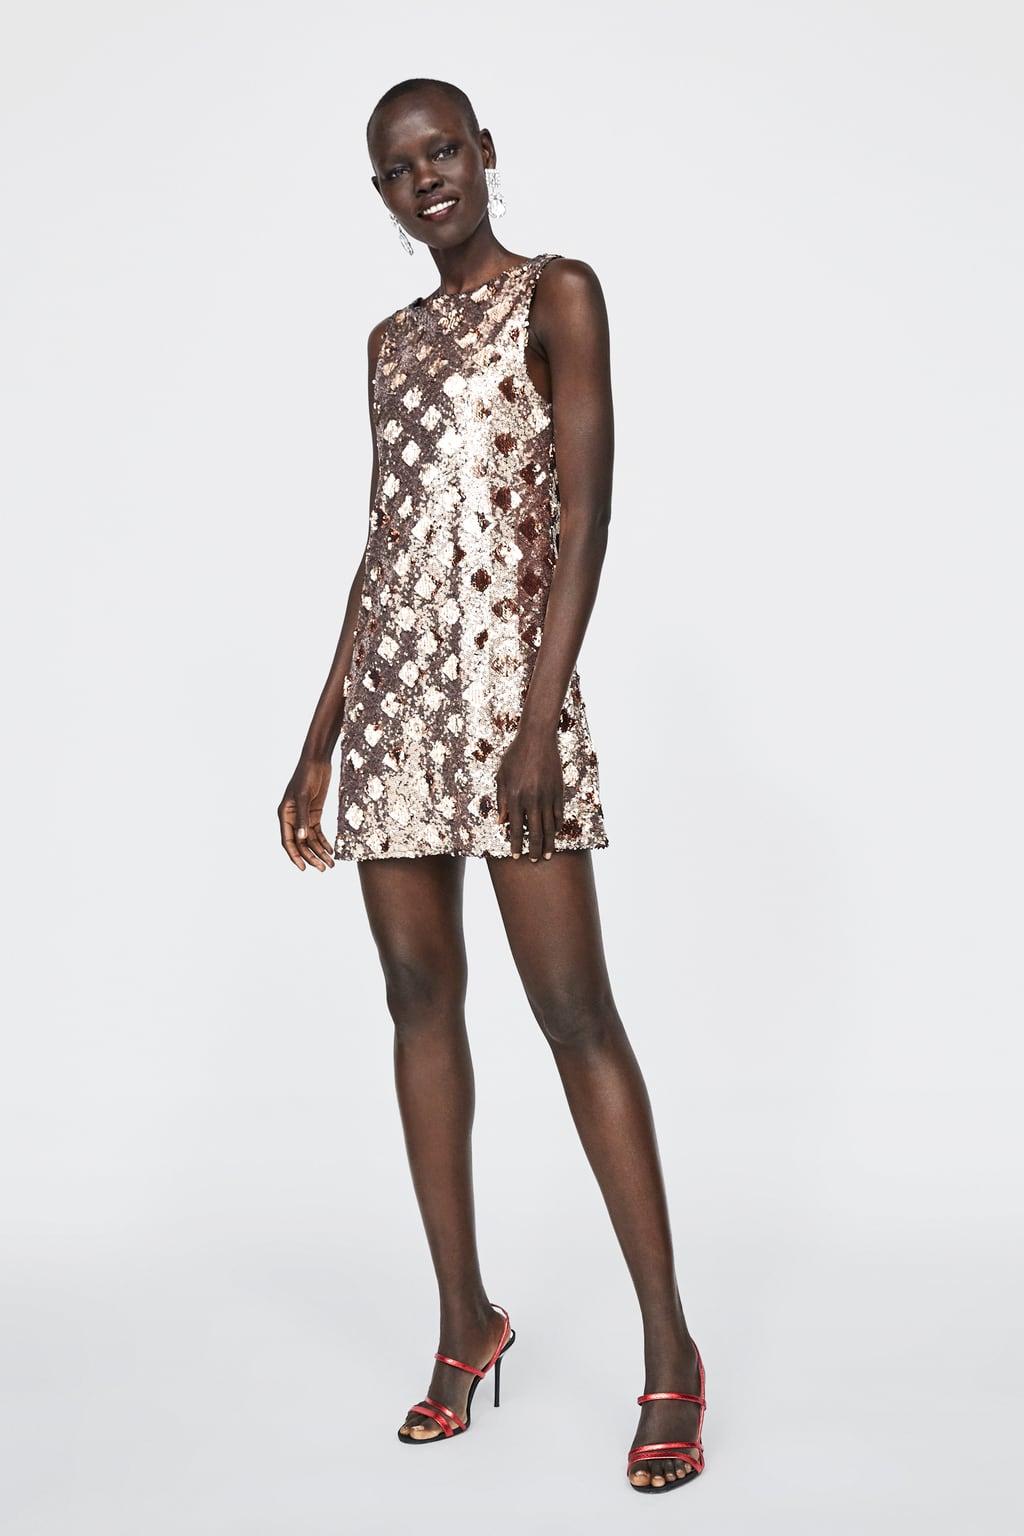 La segunda opcion seria este vestido de lentejuelas dc0c933e5fe